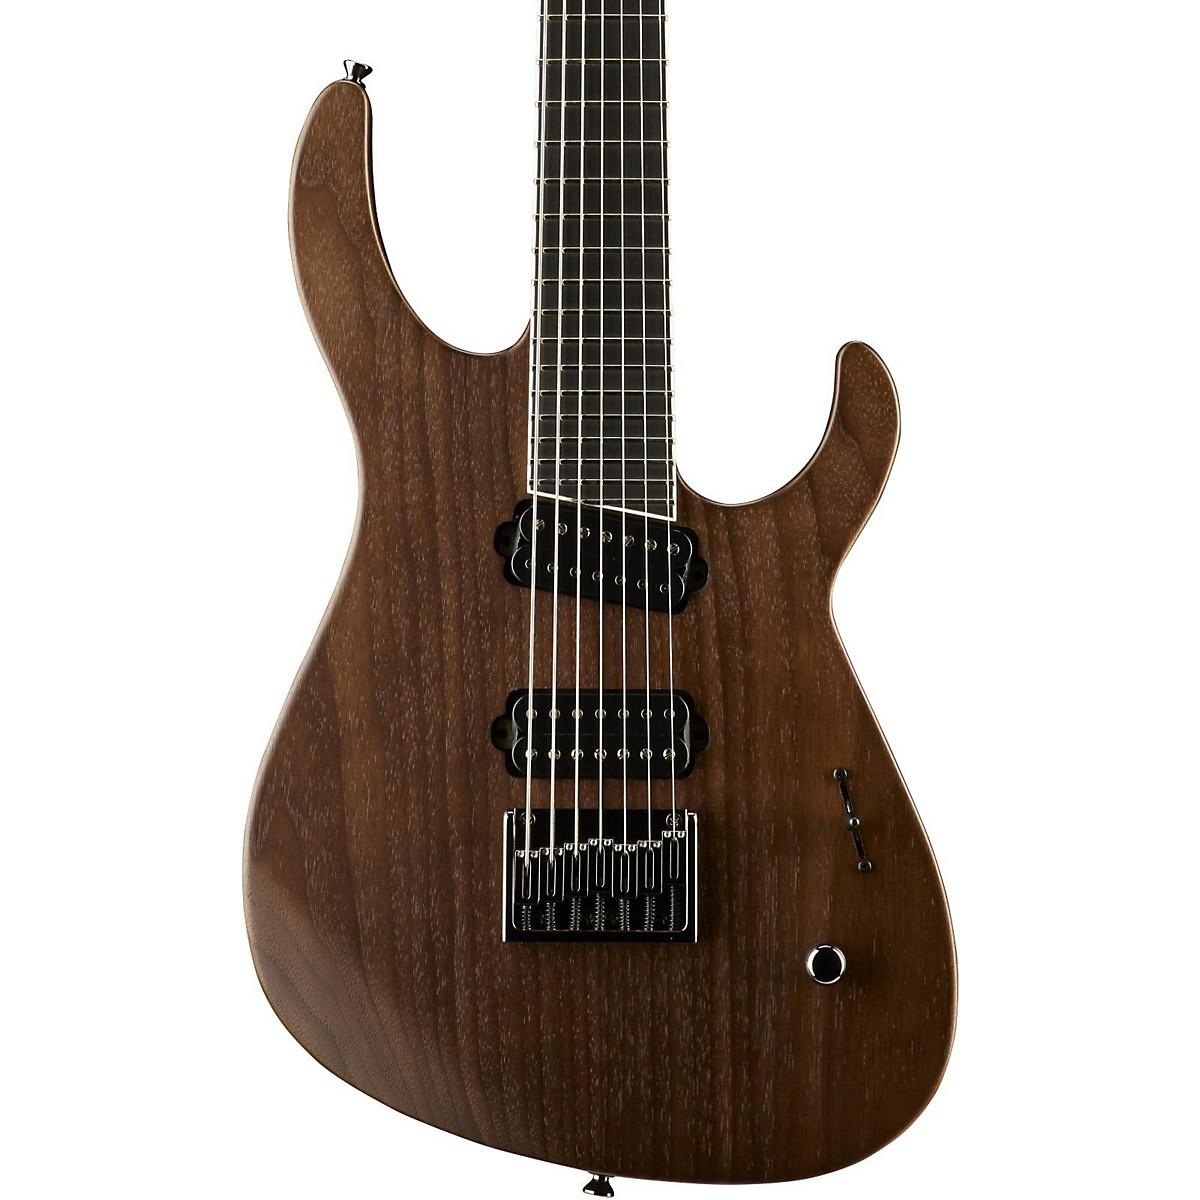 Caparison Guitars Brocken FX-WM 7-String Electric Guitar